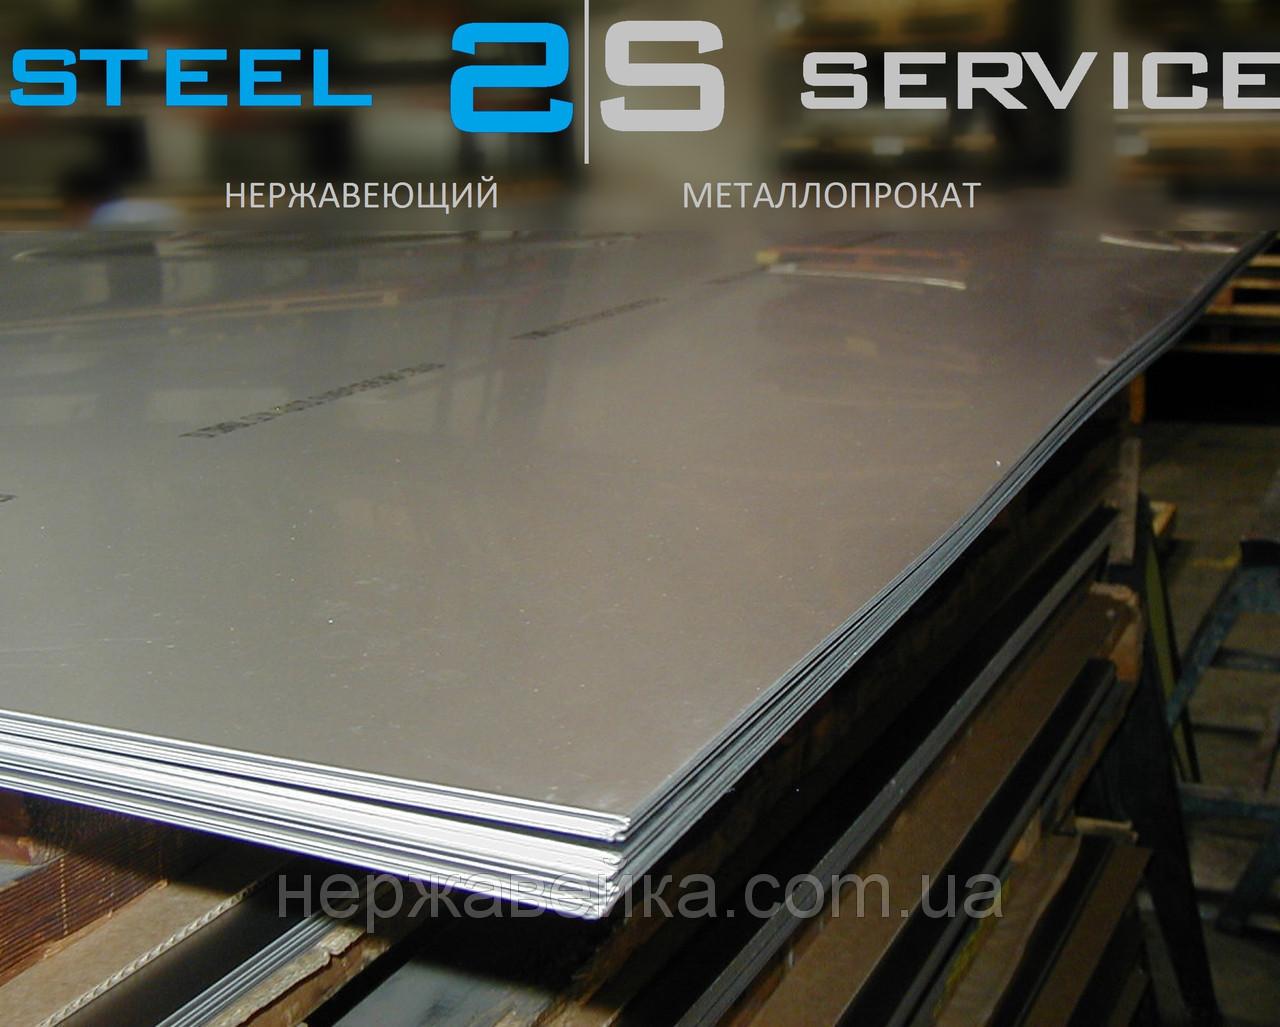 Листовая нержавейка 1,5х1250х2500мм  AISI 309(20Х23Н13, 20Х20Н14С2) 2B - матовый,  жаропрочный